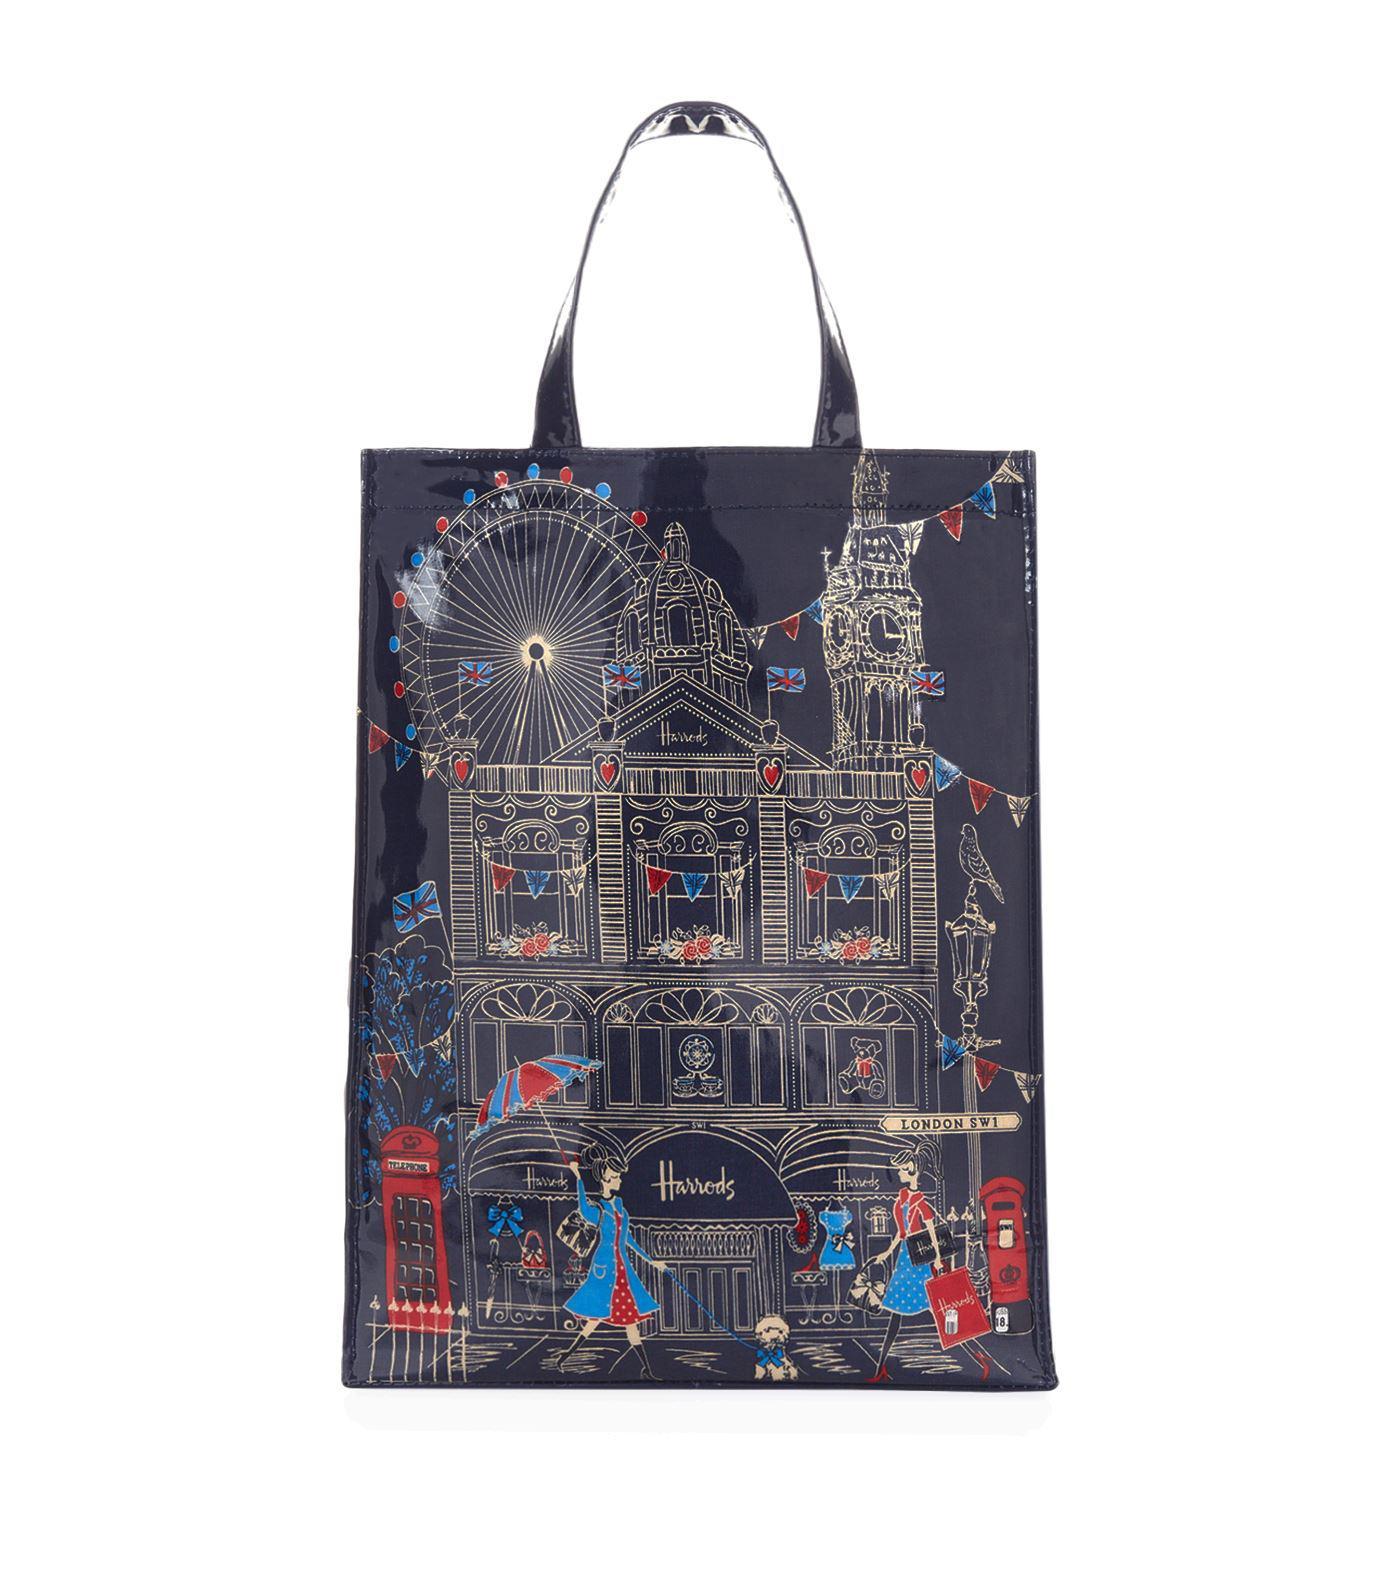 a6fadc6d016c7e Harrods Medium London Sw1 Shopper Bag in Blue - Save 16% - Lyst